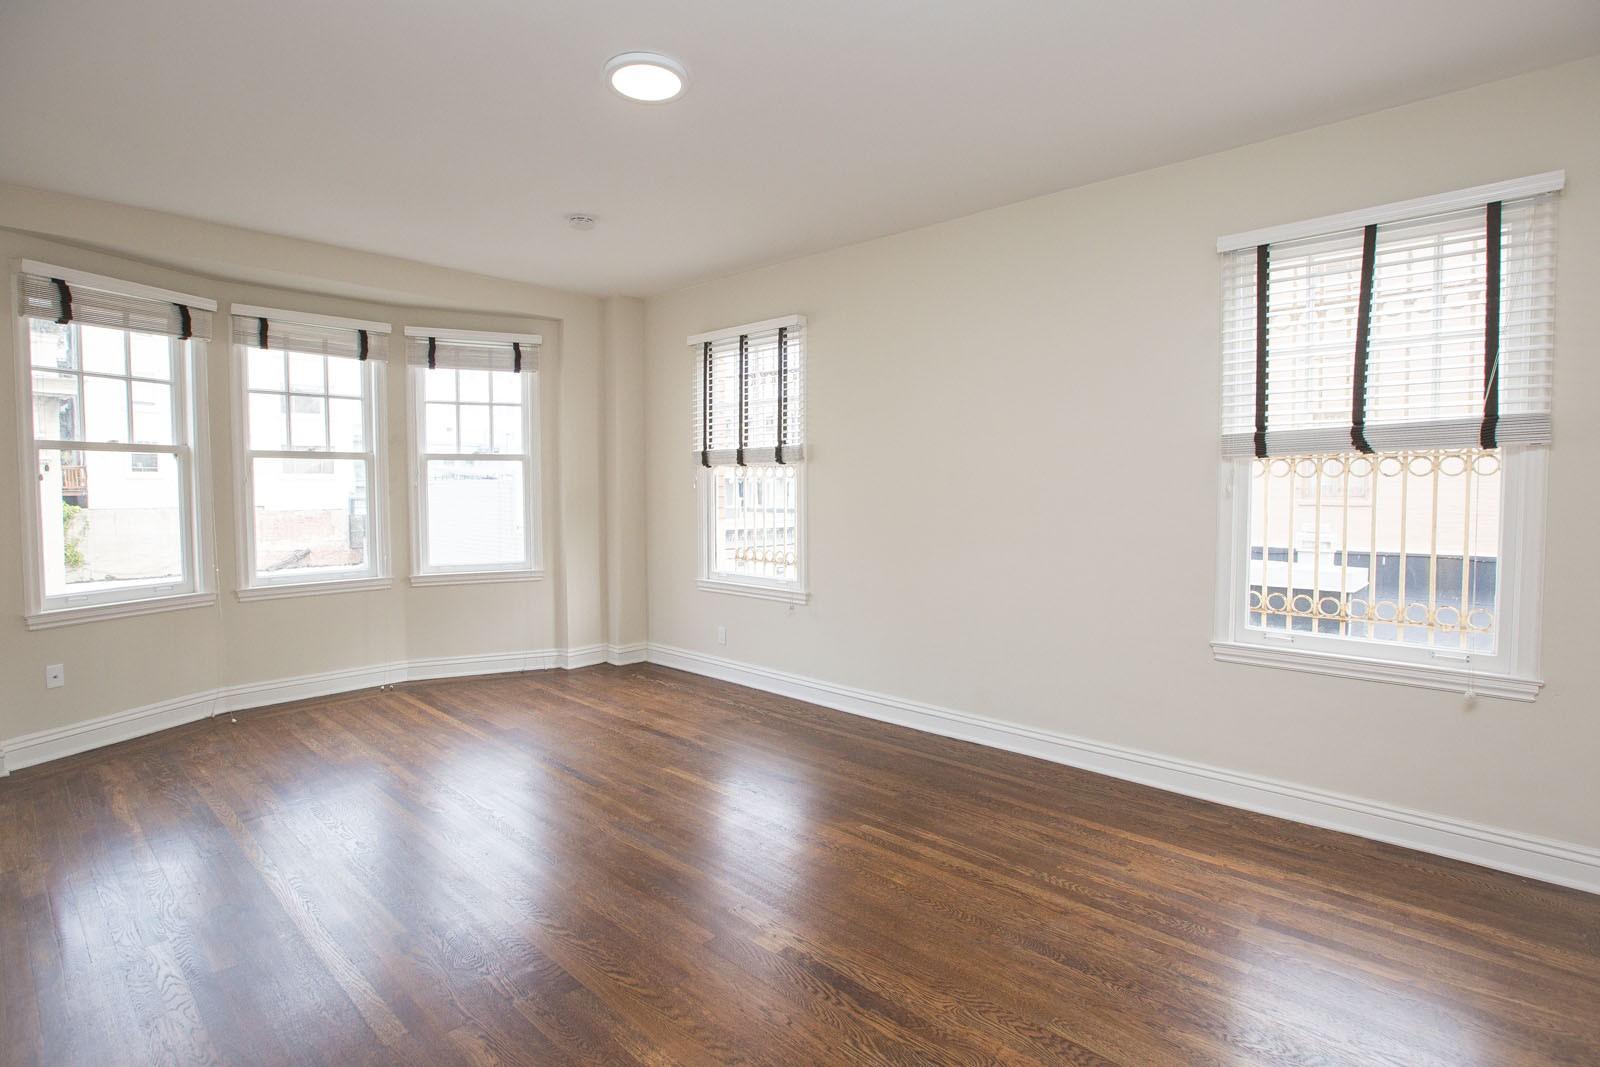 737 PINE Apartments & Suites